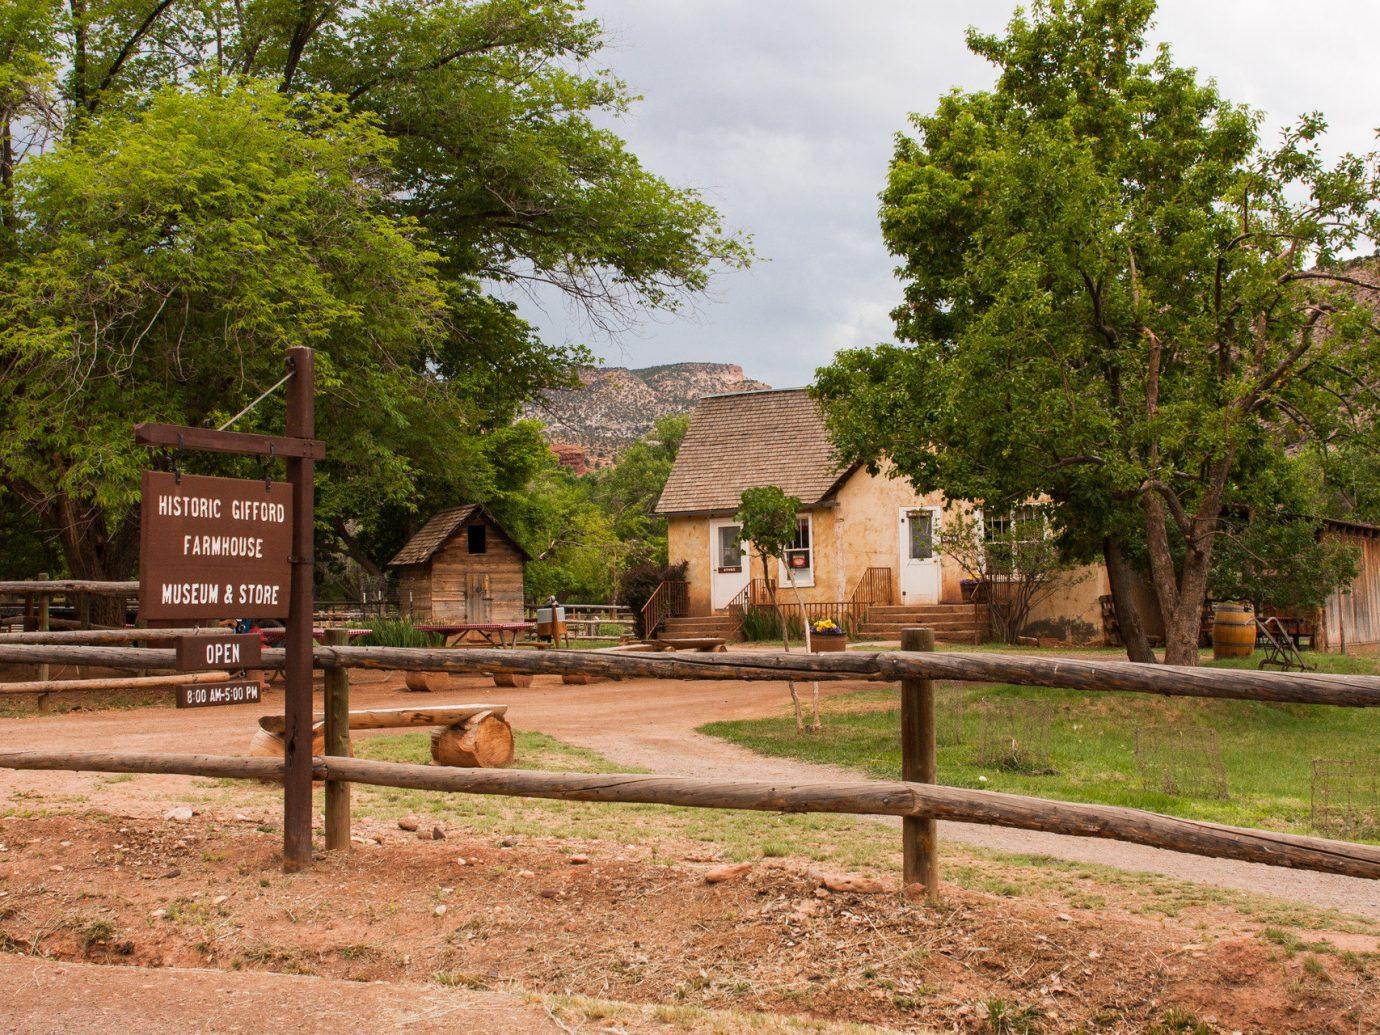 National Parks Outdoors + Adventure Trip Ideas tree outdoor ground grass park estate rural area Village home waterway Garden dirt area